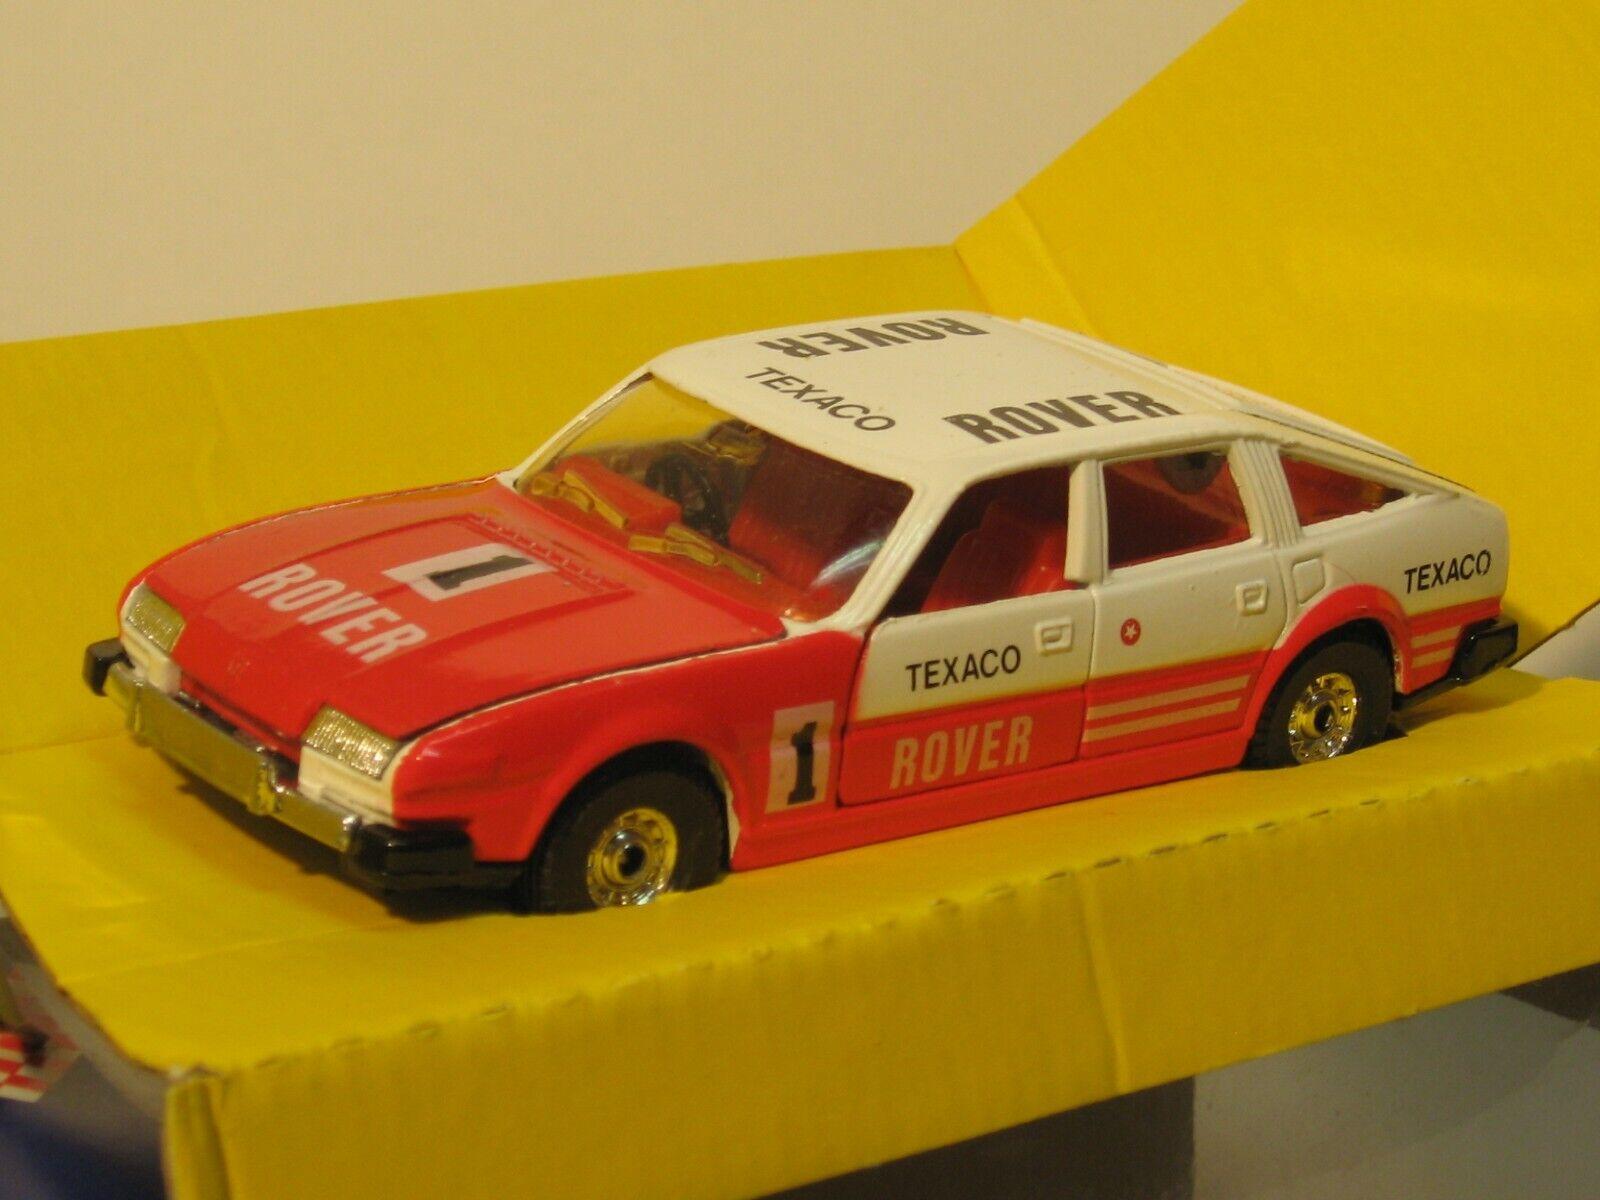 Corgi C404 b Rover 3500  sd1 Texaco N°1 1986 Neuve en boîte (426) 1 36